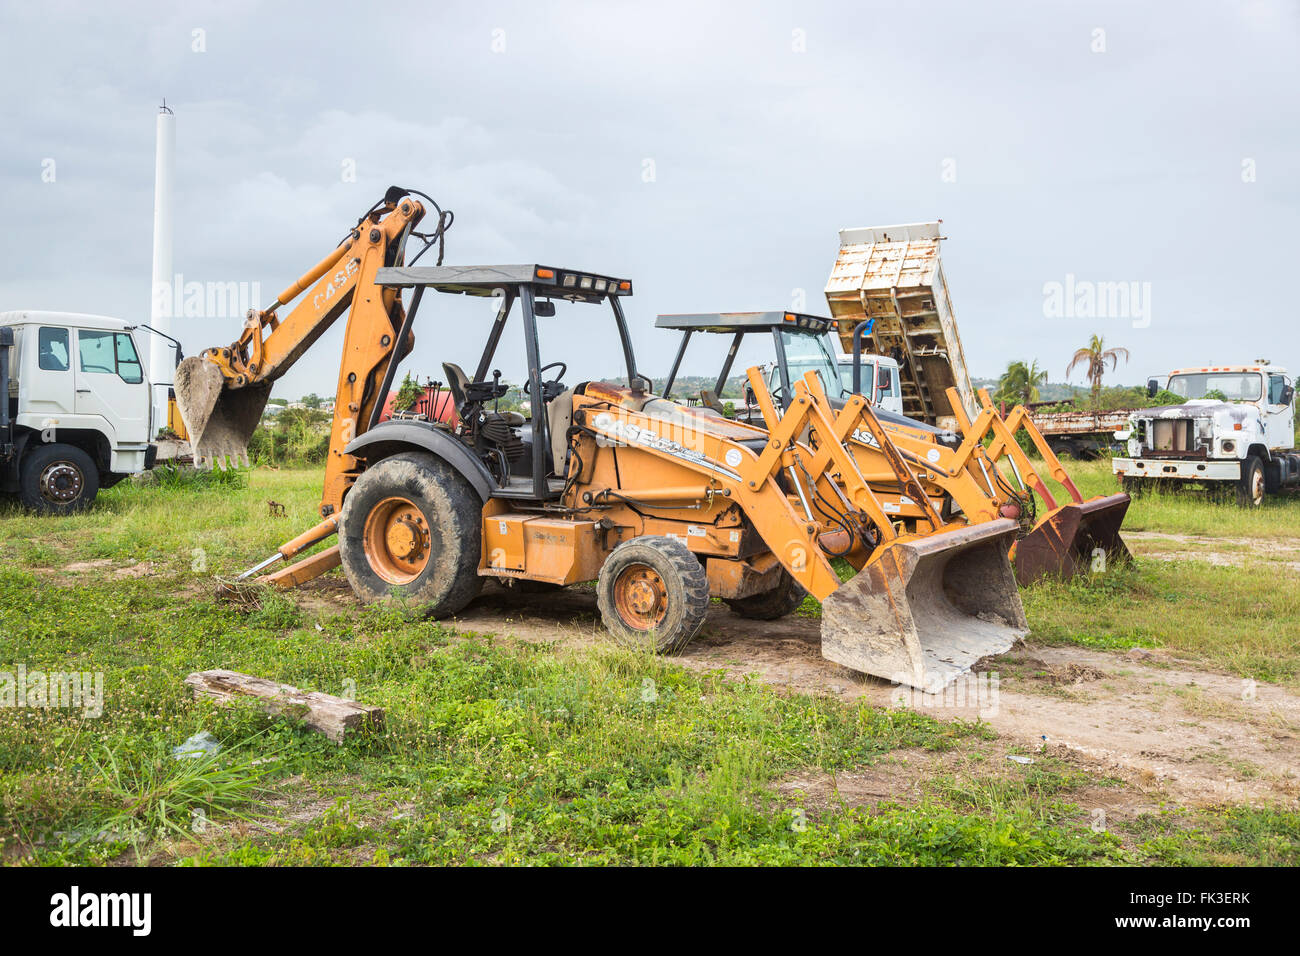 Yellow Case Manufacturers digger in Ogg Spencer's Trucking scrapyard, Liberta, south Antigua, Antigua and Barbuda, - Stock Image